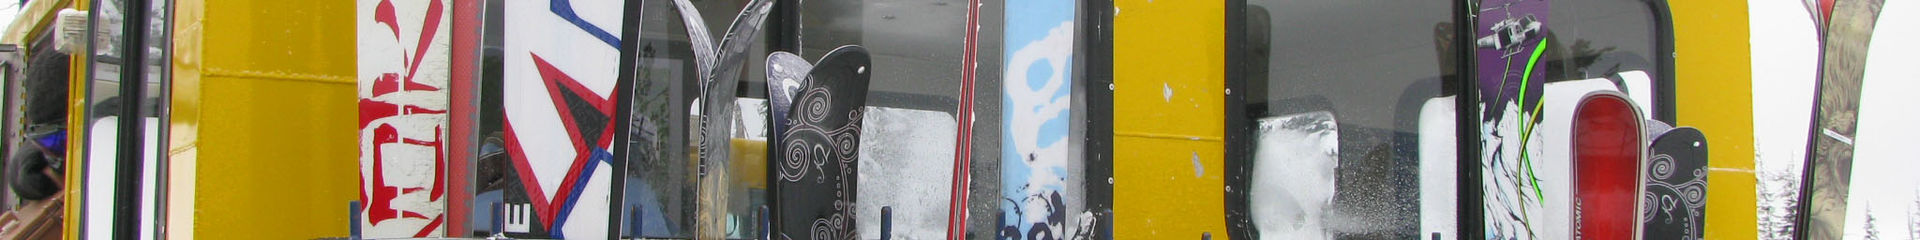 Brundage Cat Skiing